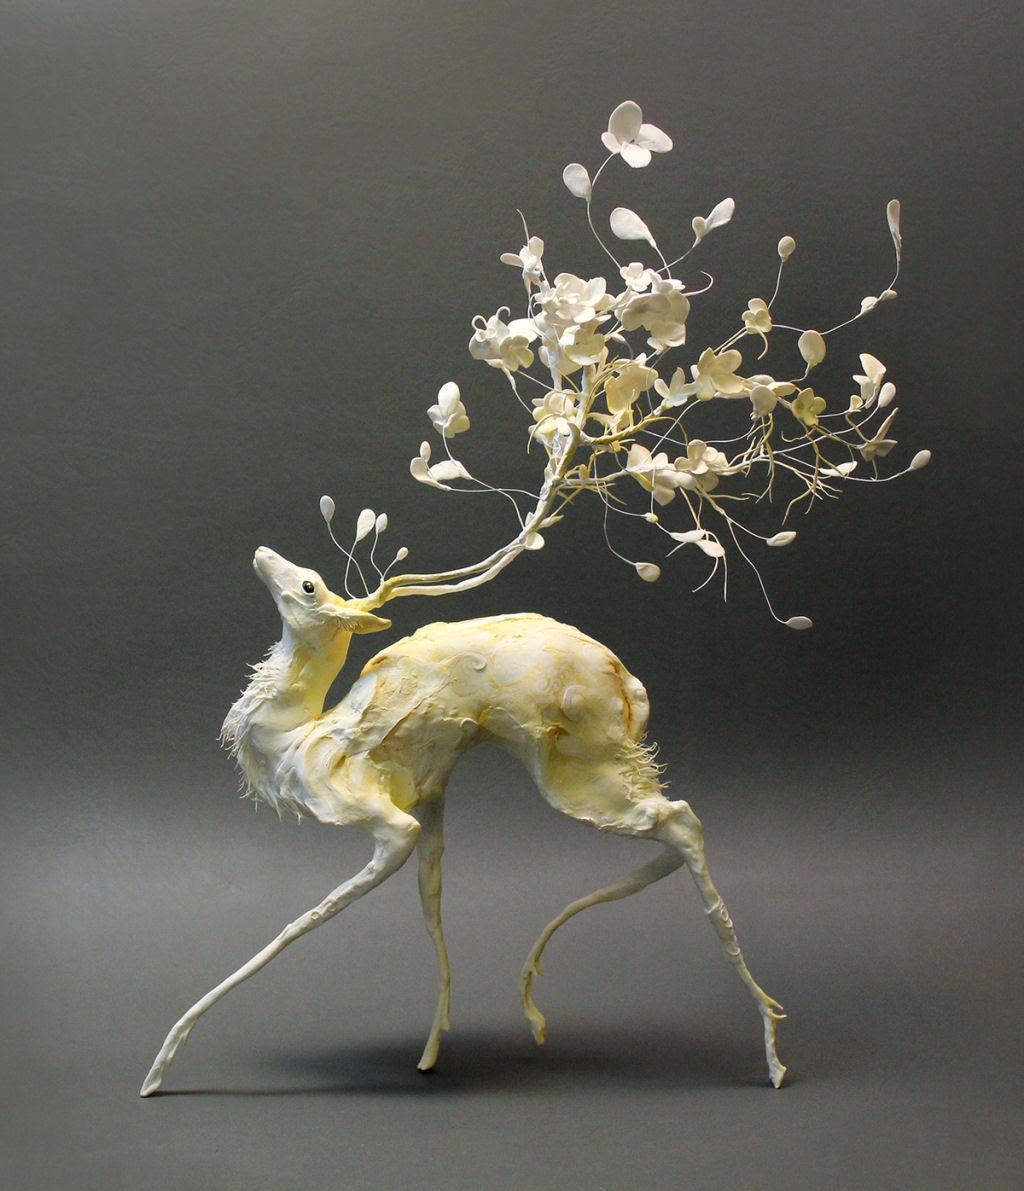 As esculturas surrealistas de Ellen Jewett mesclam plantas e vida animal 01